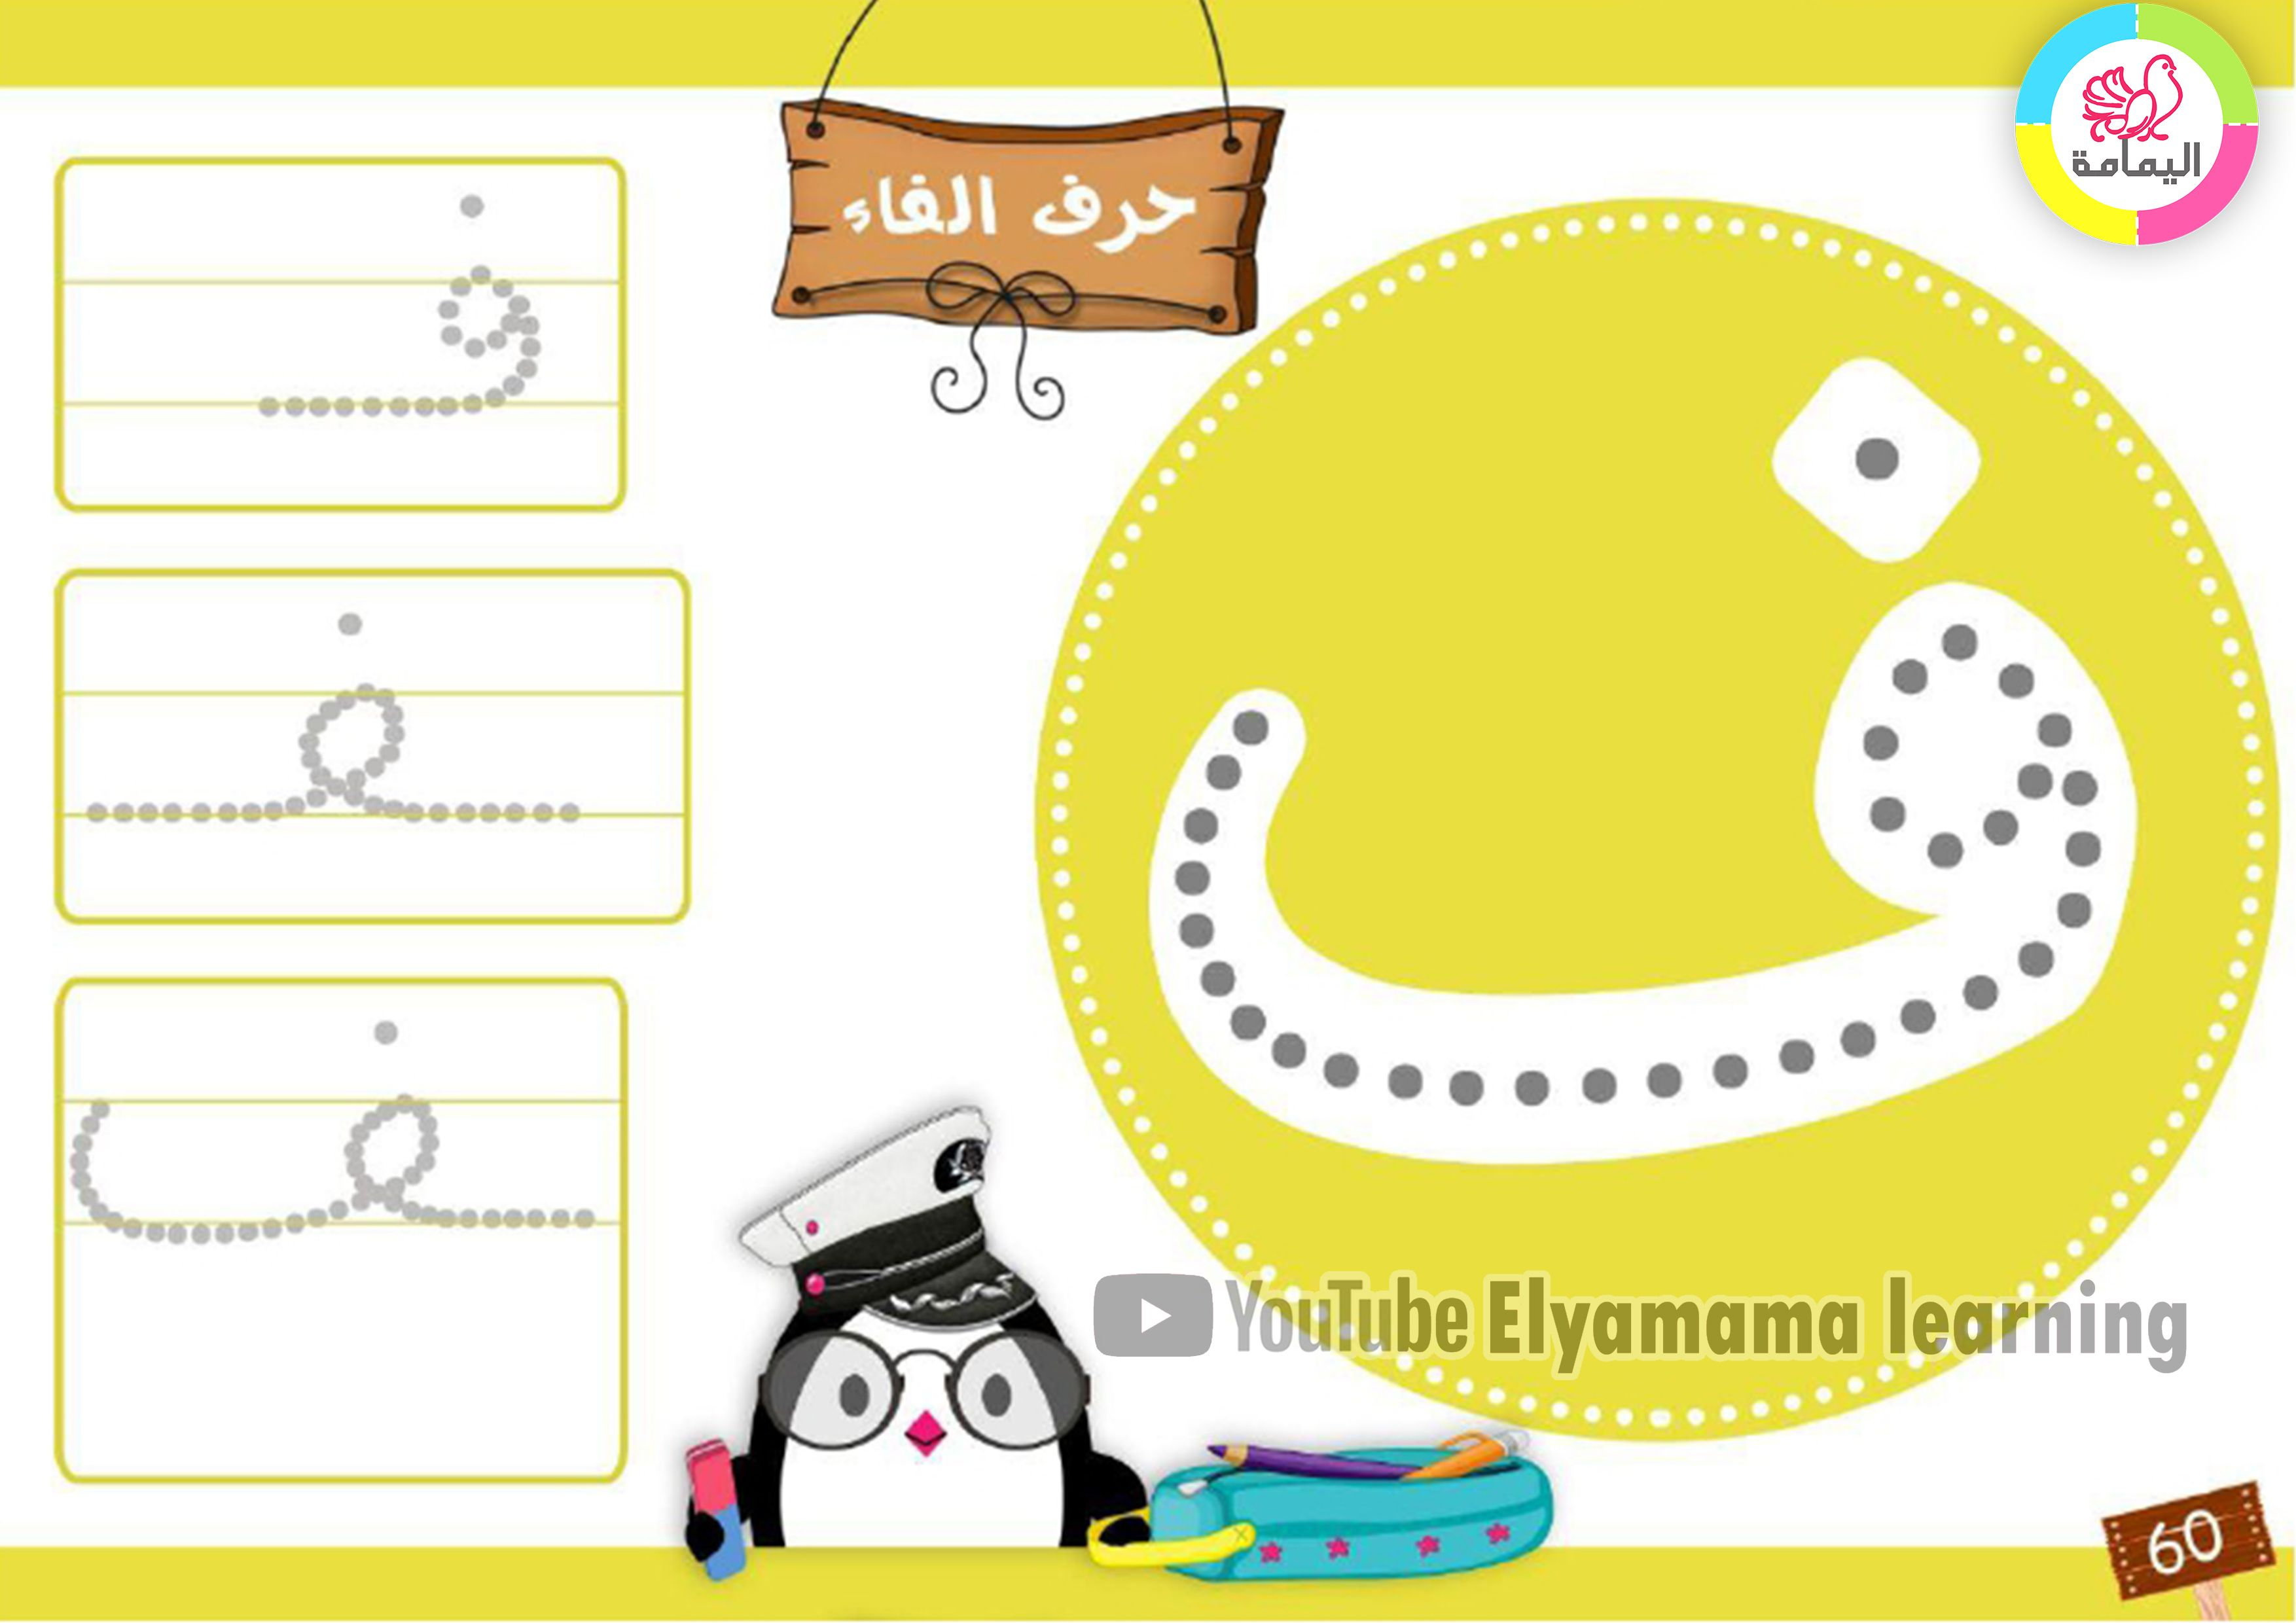 حرف الفاء Alphabet For Kids Arabic Alphabet For Kids Arabic Kids